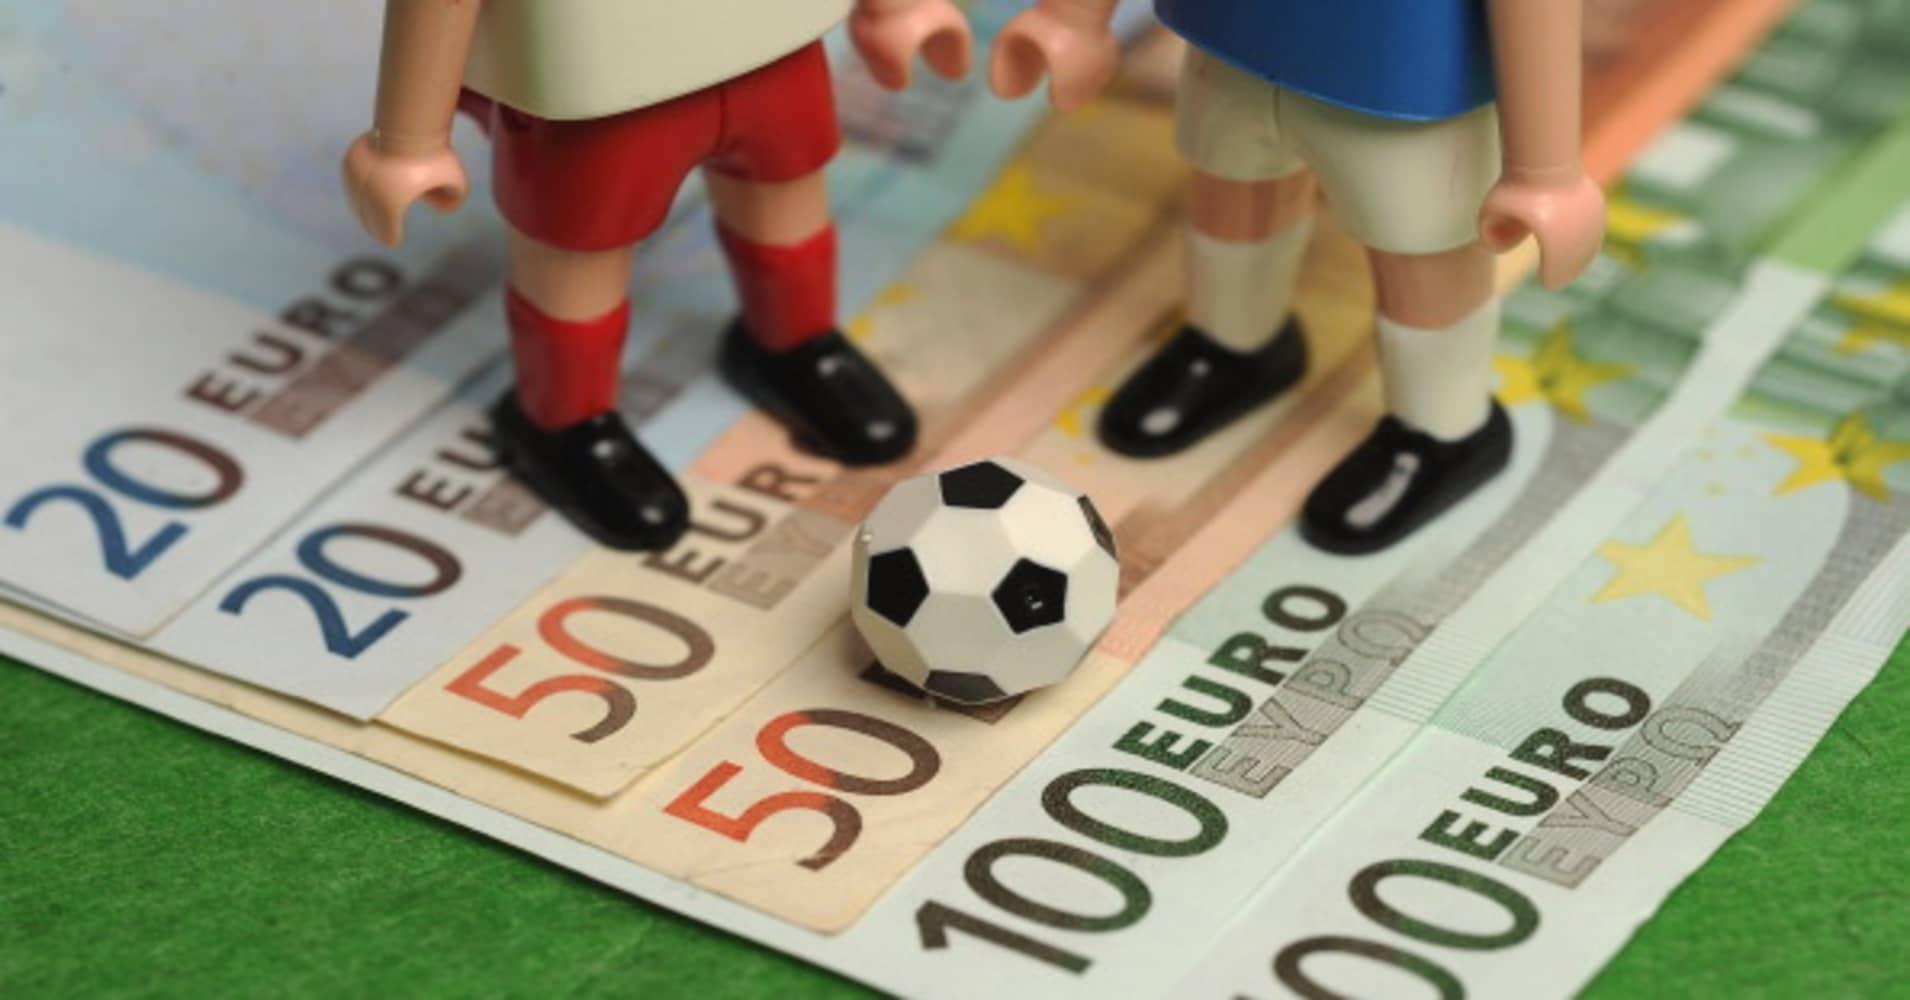 Ireland gambling control bill 2013 miglior casino gratis